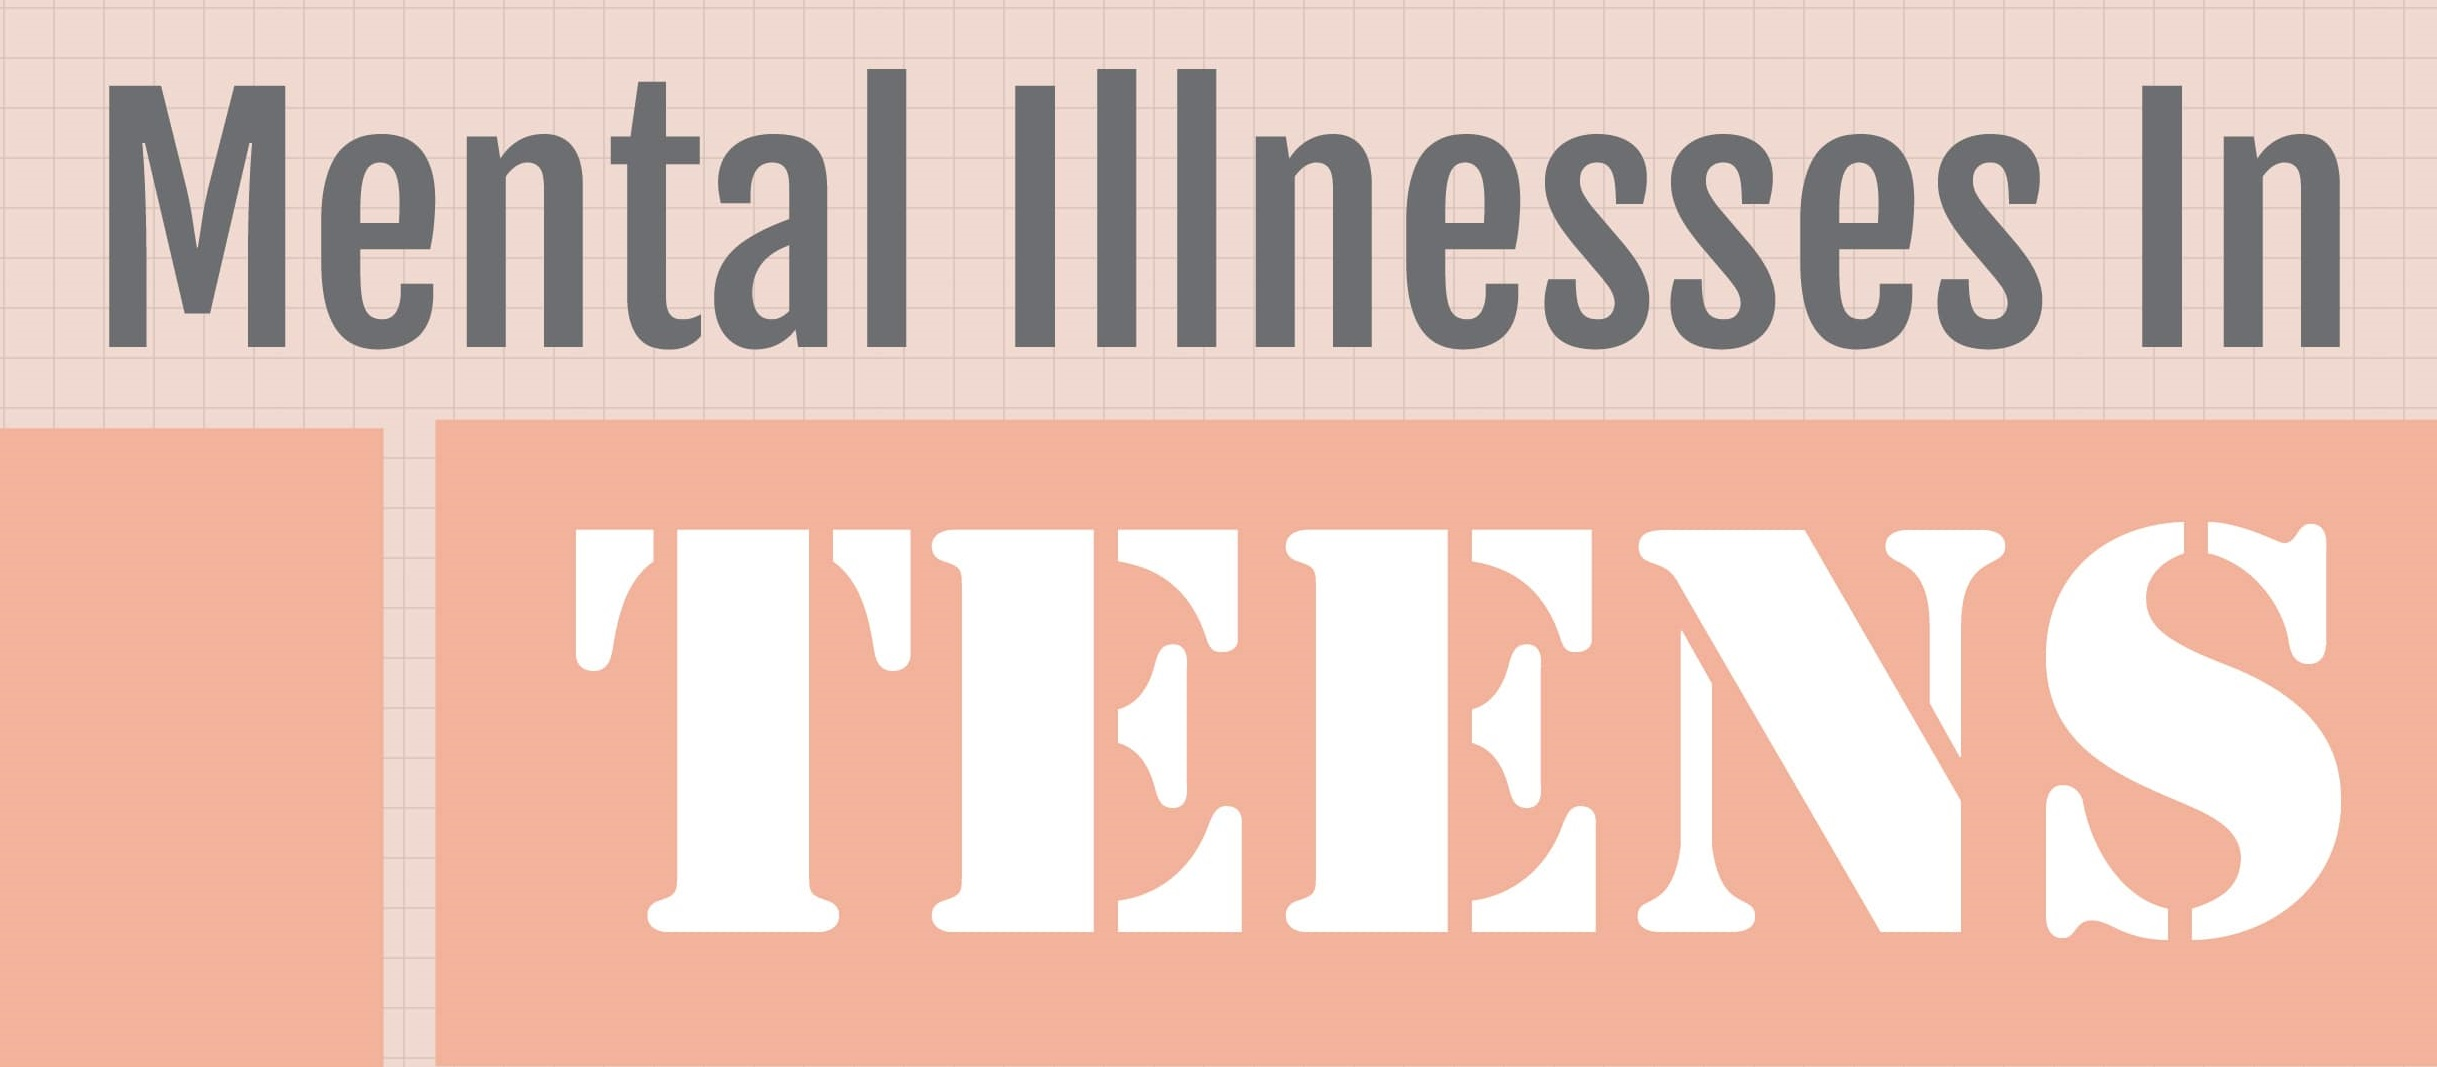 Mental Illnesses in Teens